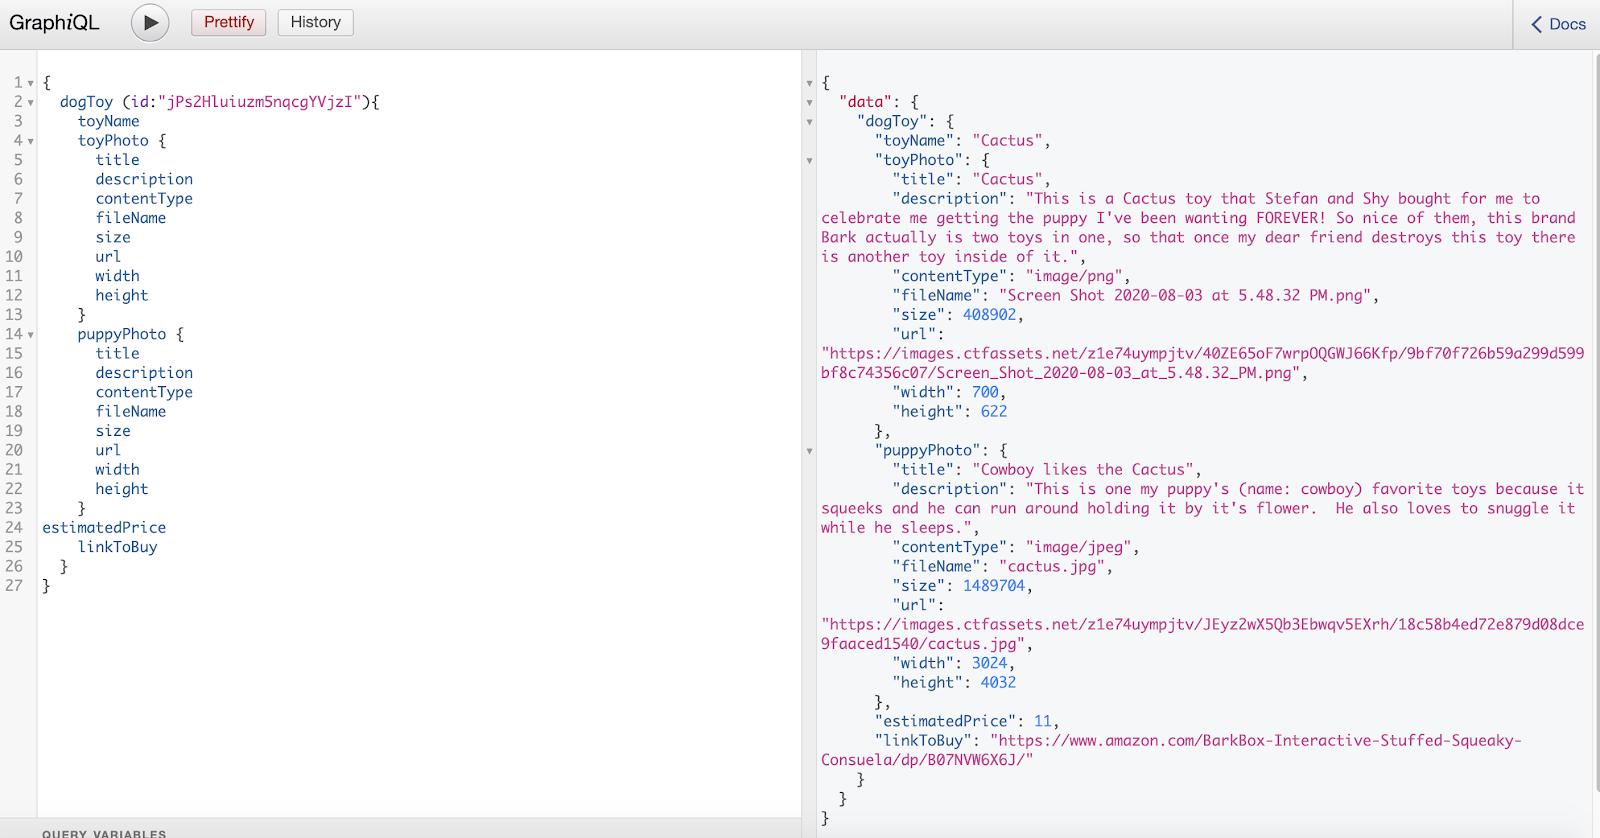 Screenshot of the GraphiQL documentation fields